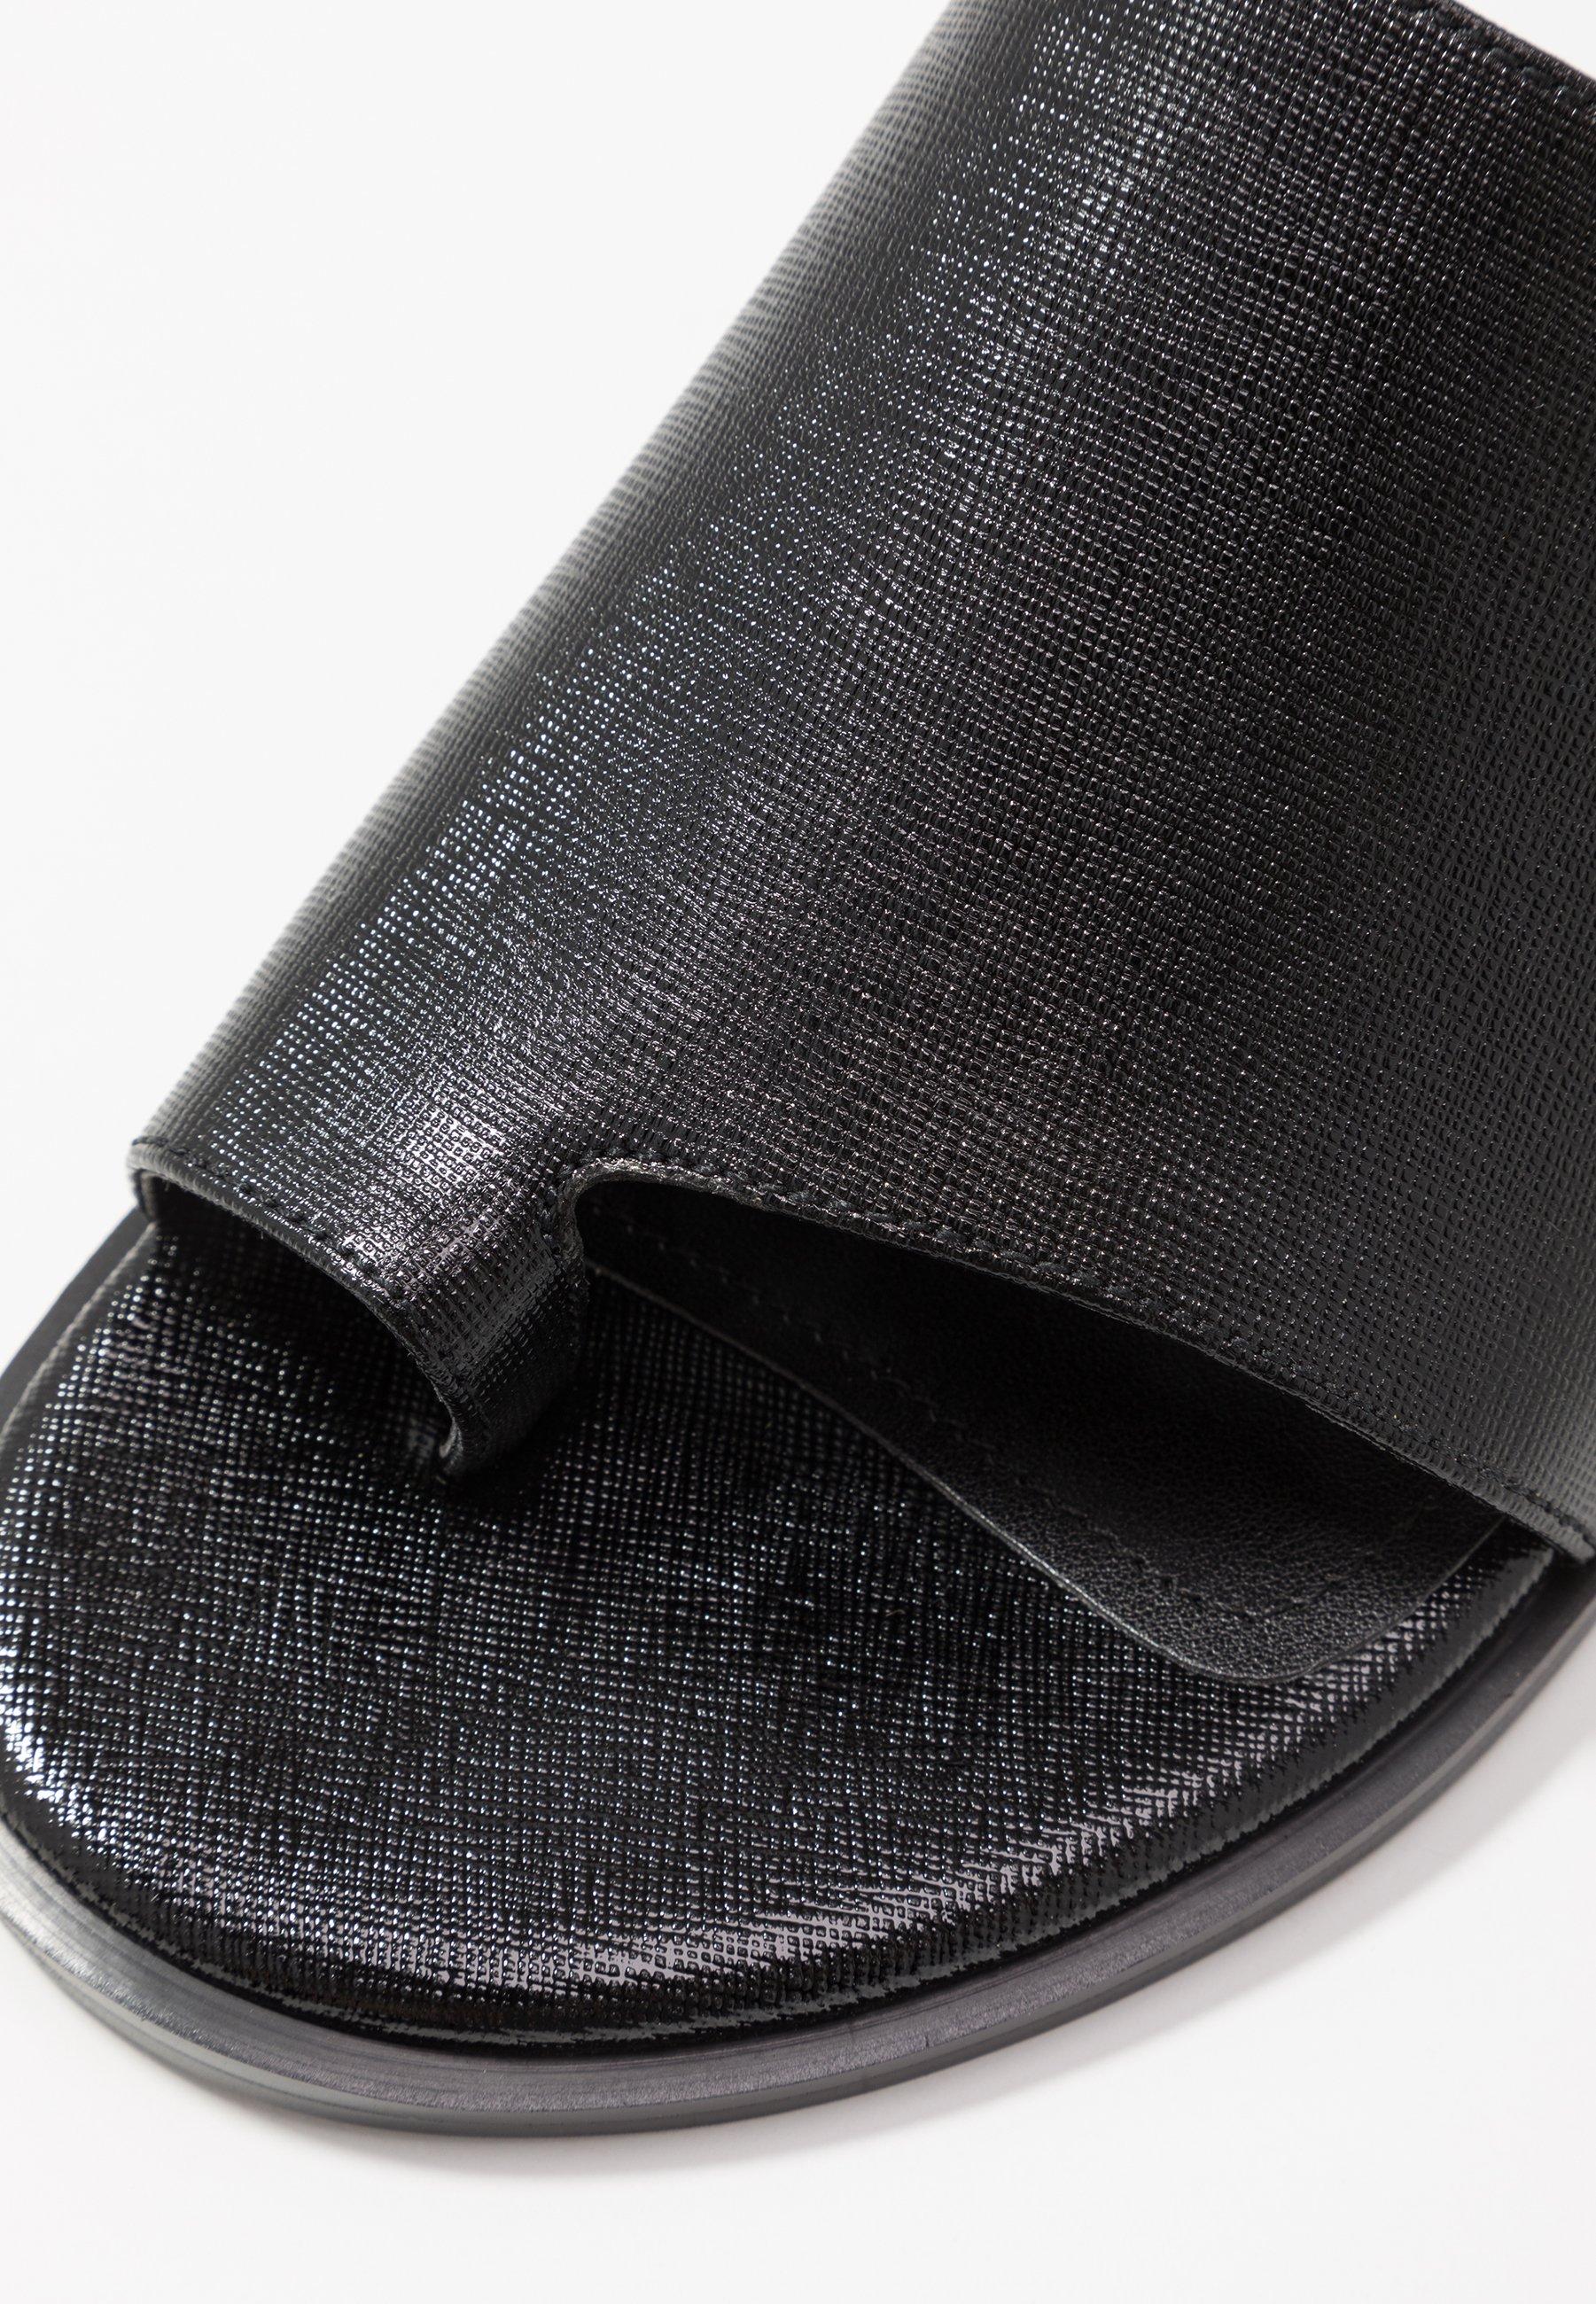 Dkny Daz Flat Slide - Tongs Black